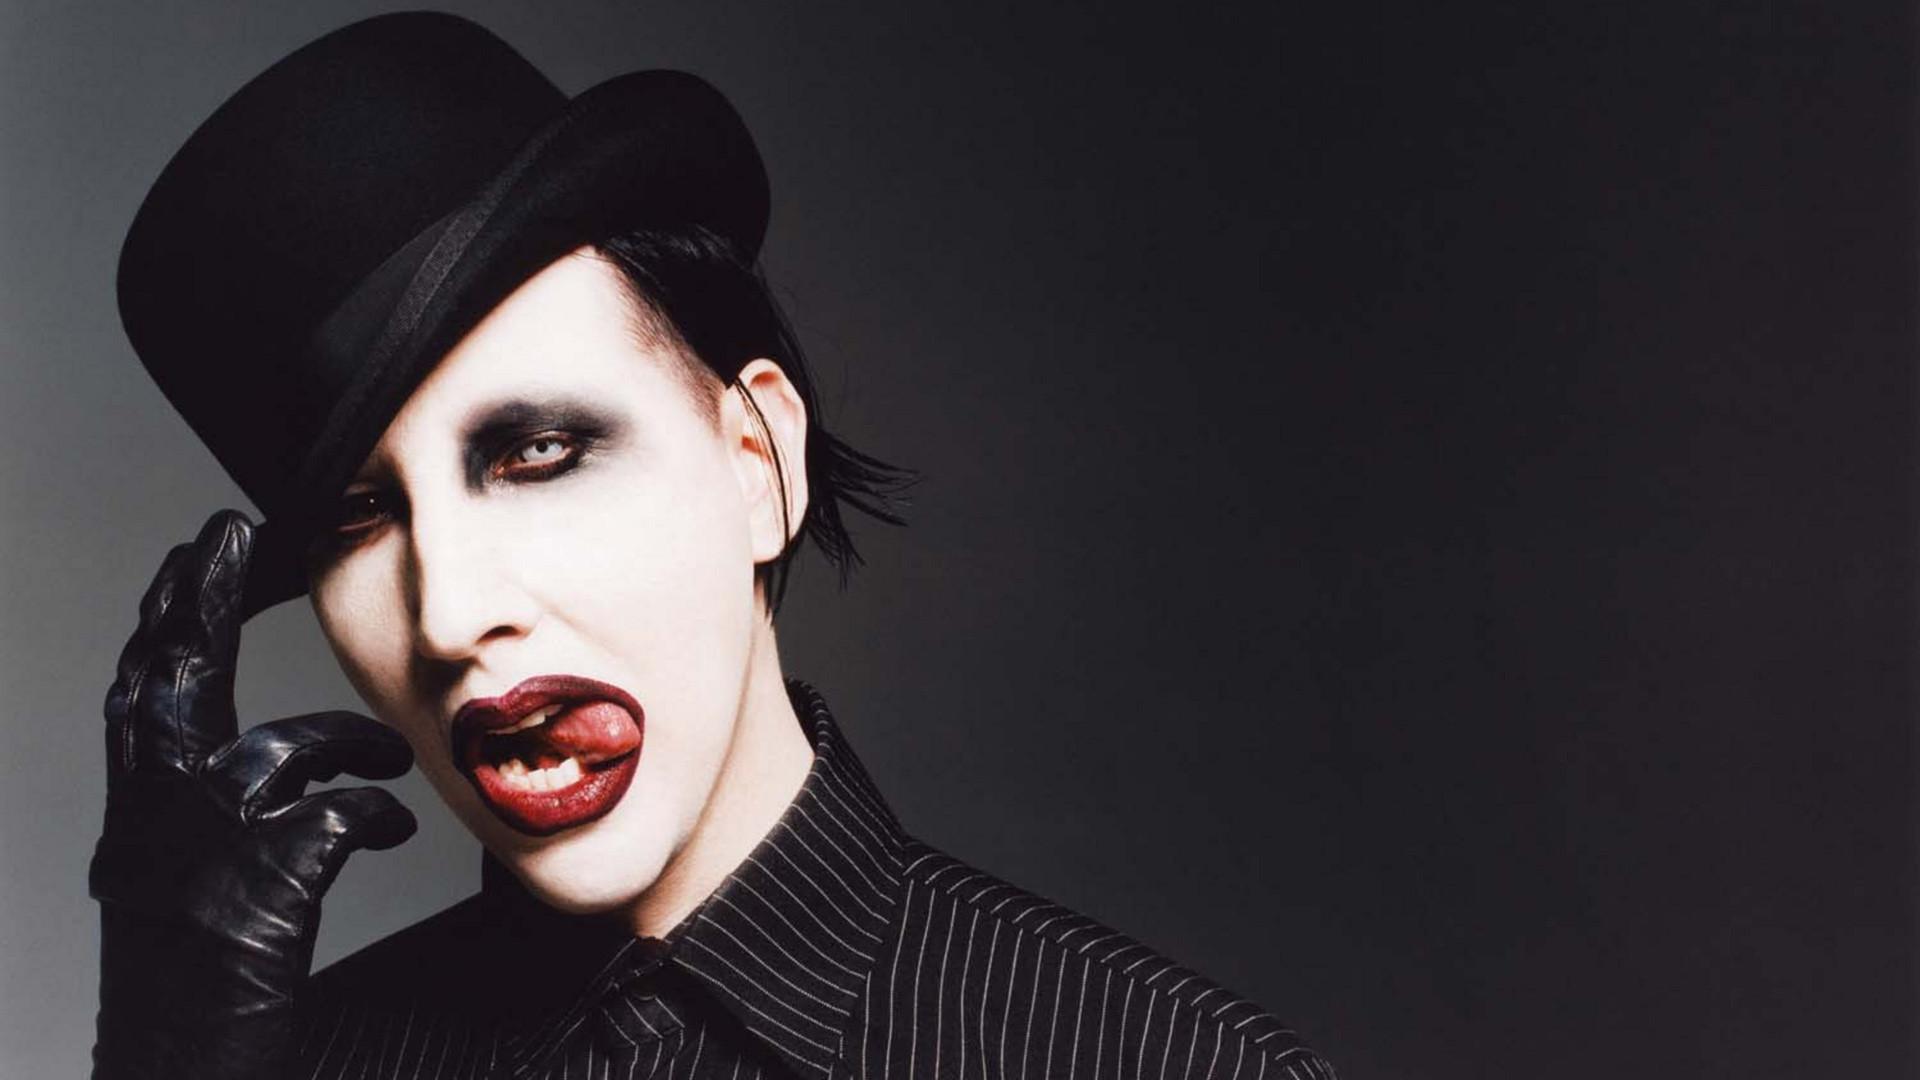 Marilyn Manson Wallpapers – HD Wallpapers 23544   Download Wallpaper    Pinterest   Marilyn manson and Wallpaper